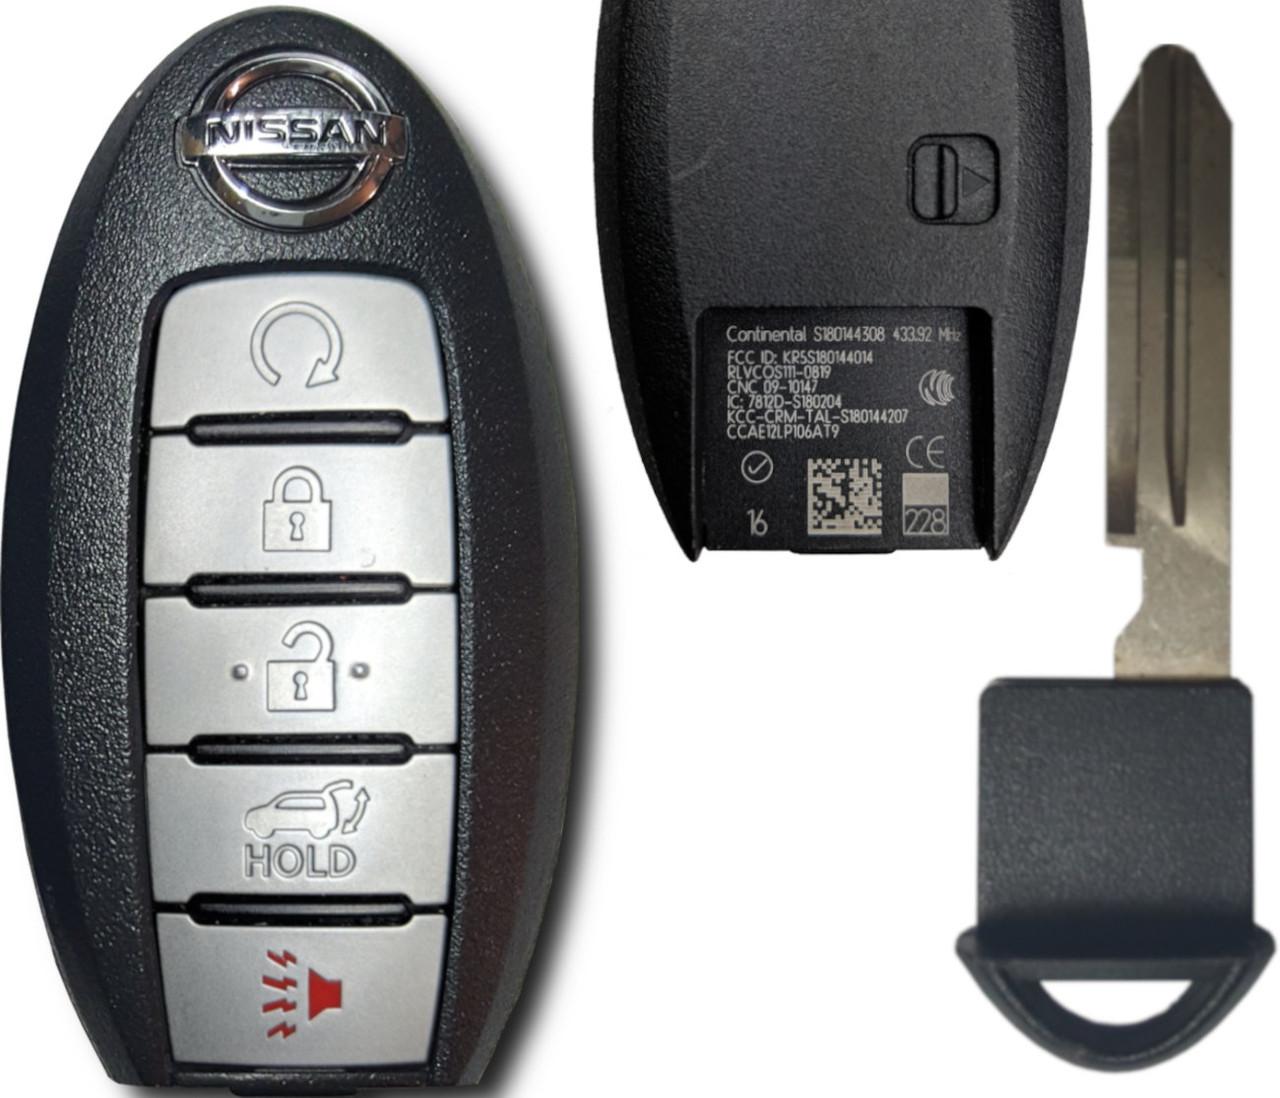 NEW Keyless Entry Key Fob Remote For a 2011 Nissan Rogue 3 BTN Smart Key